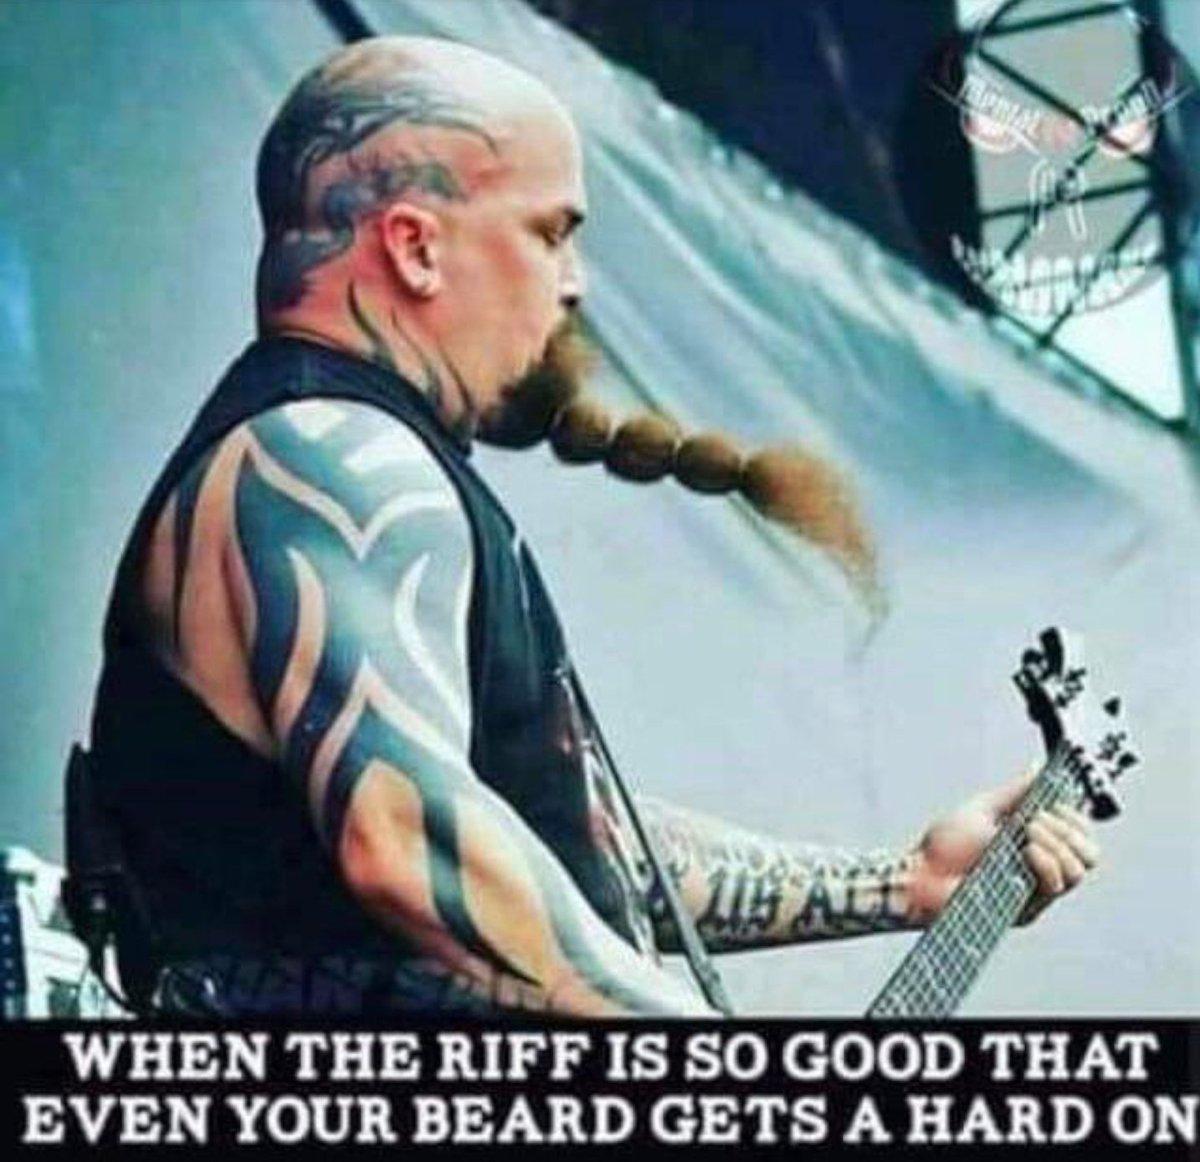 Metal: the full body Viagra @Slayer #fridaymorning #FridayVibes #slayer #MetalMusic #metal @HATEMACHINEDave